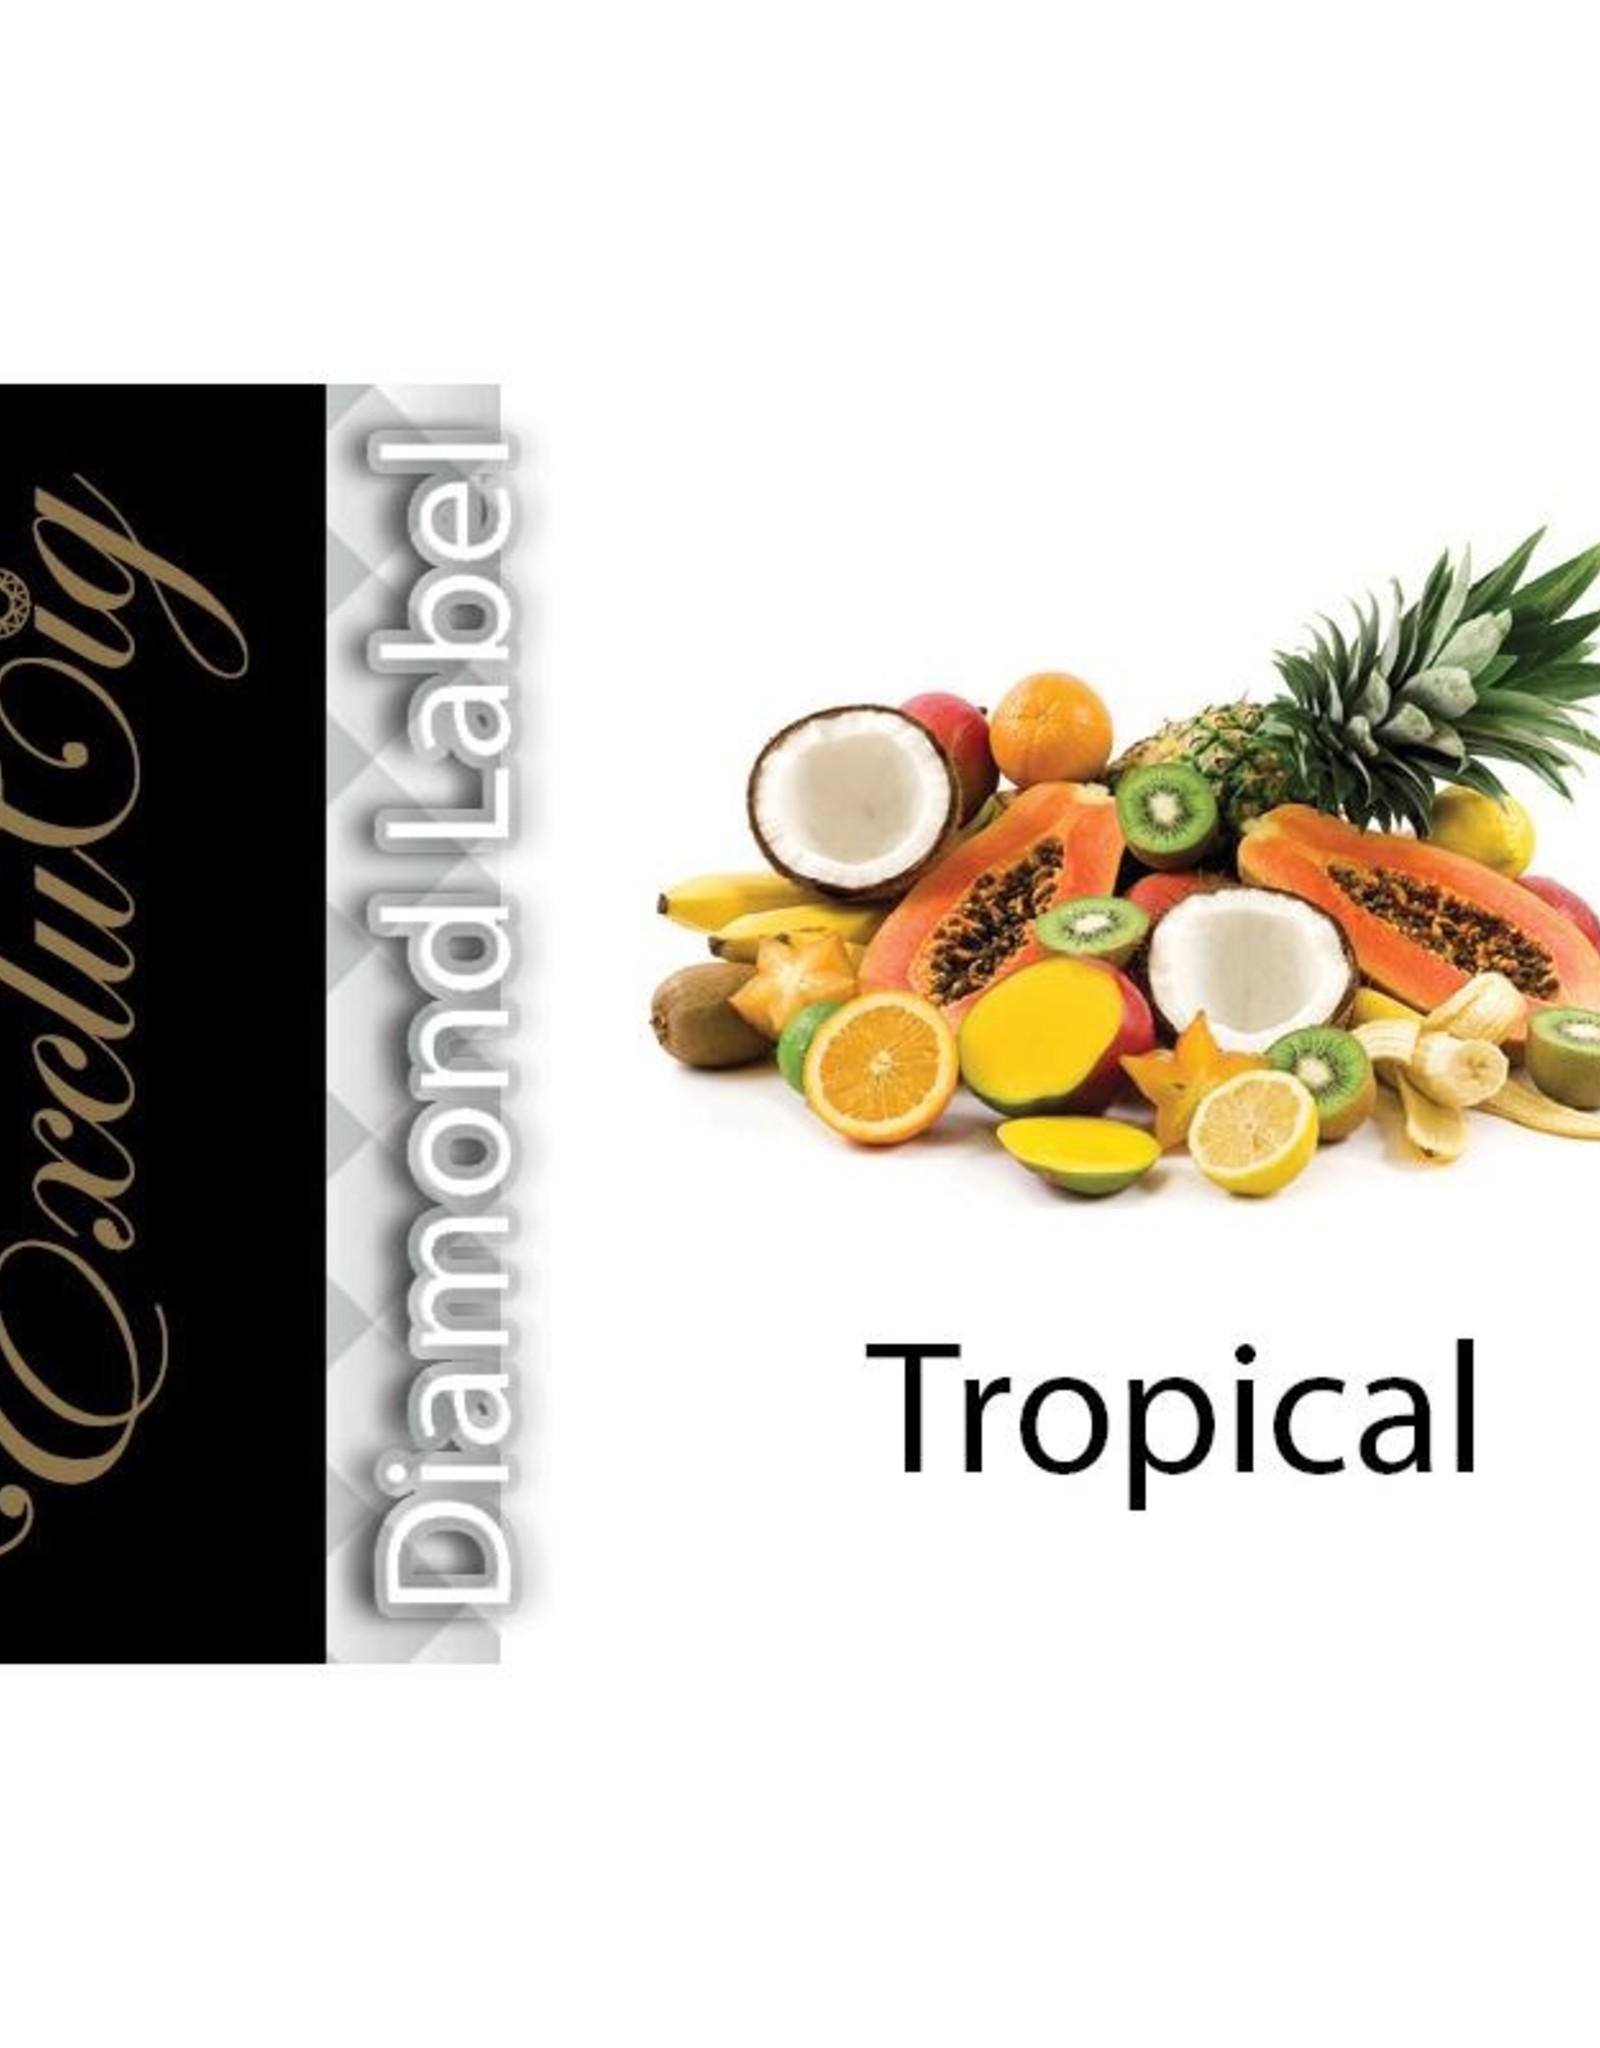 Exclucig Exclucig Diamond Label E-liquid Tropical 3 mg Nicotine